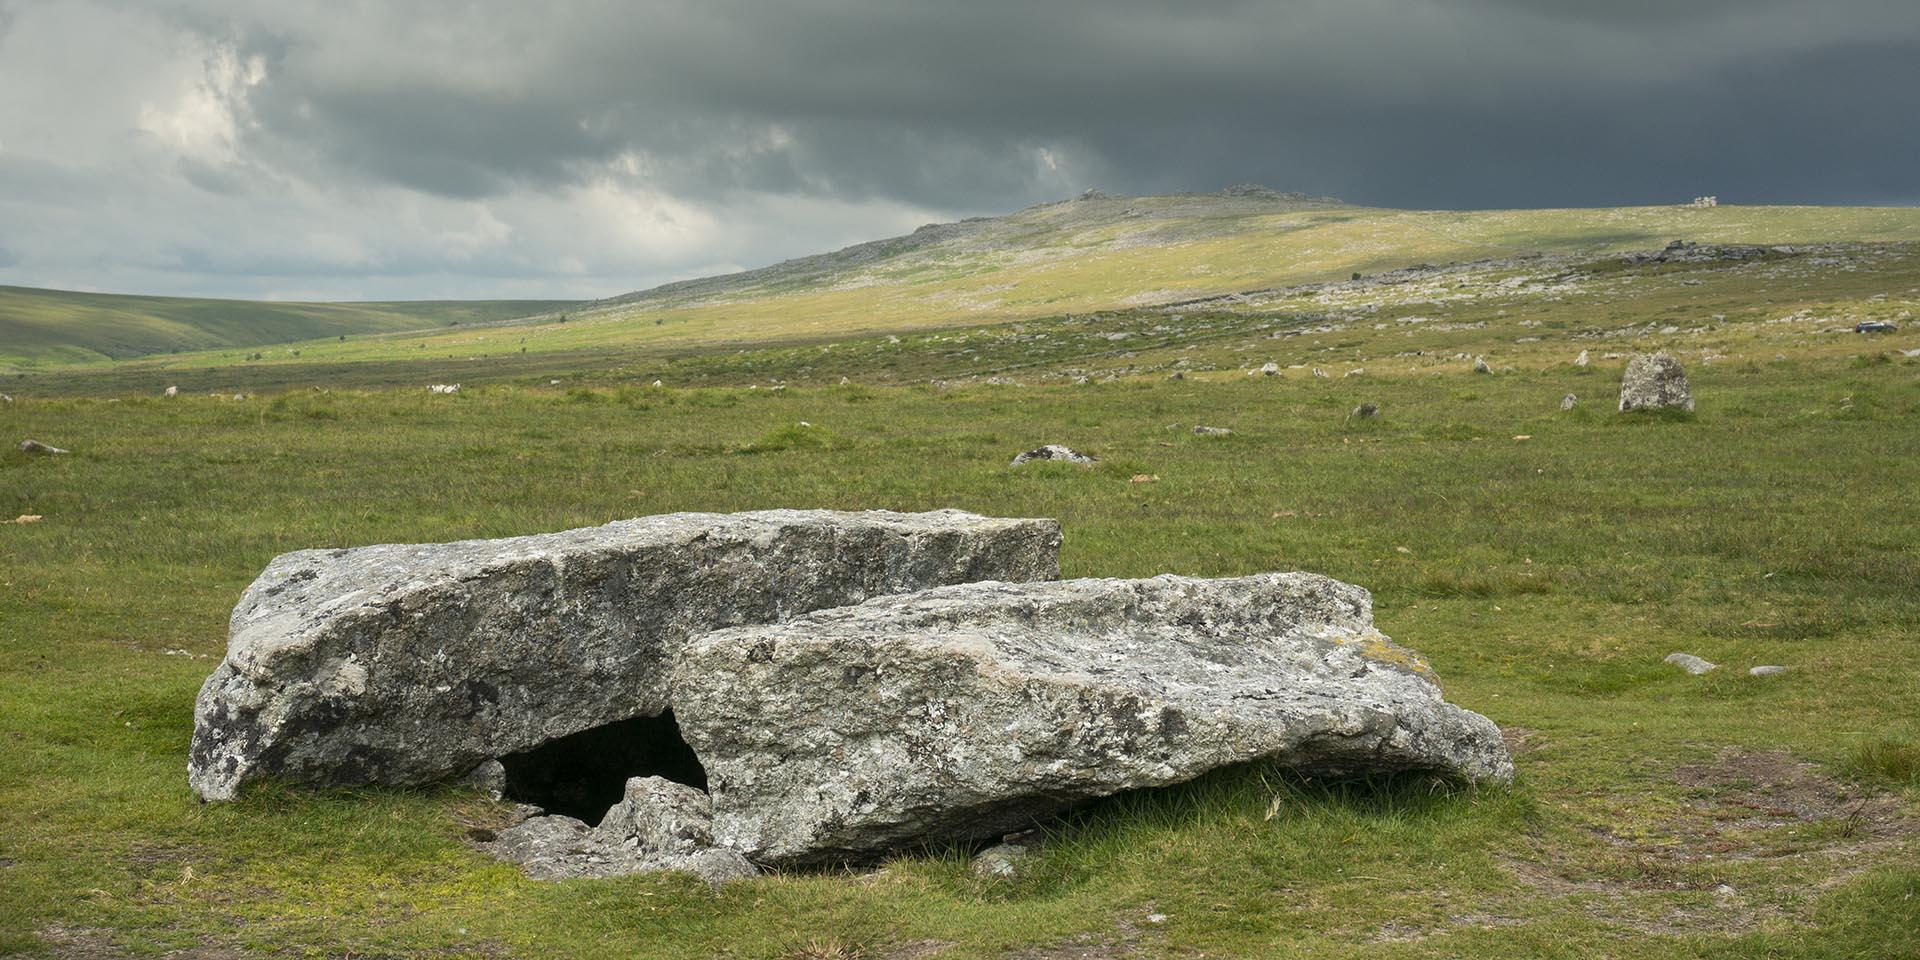 Burial cist at Merrivale